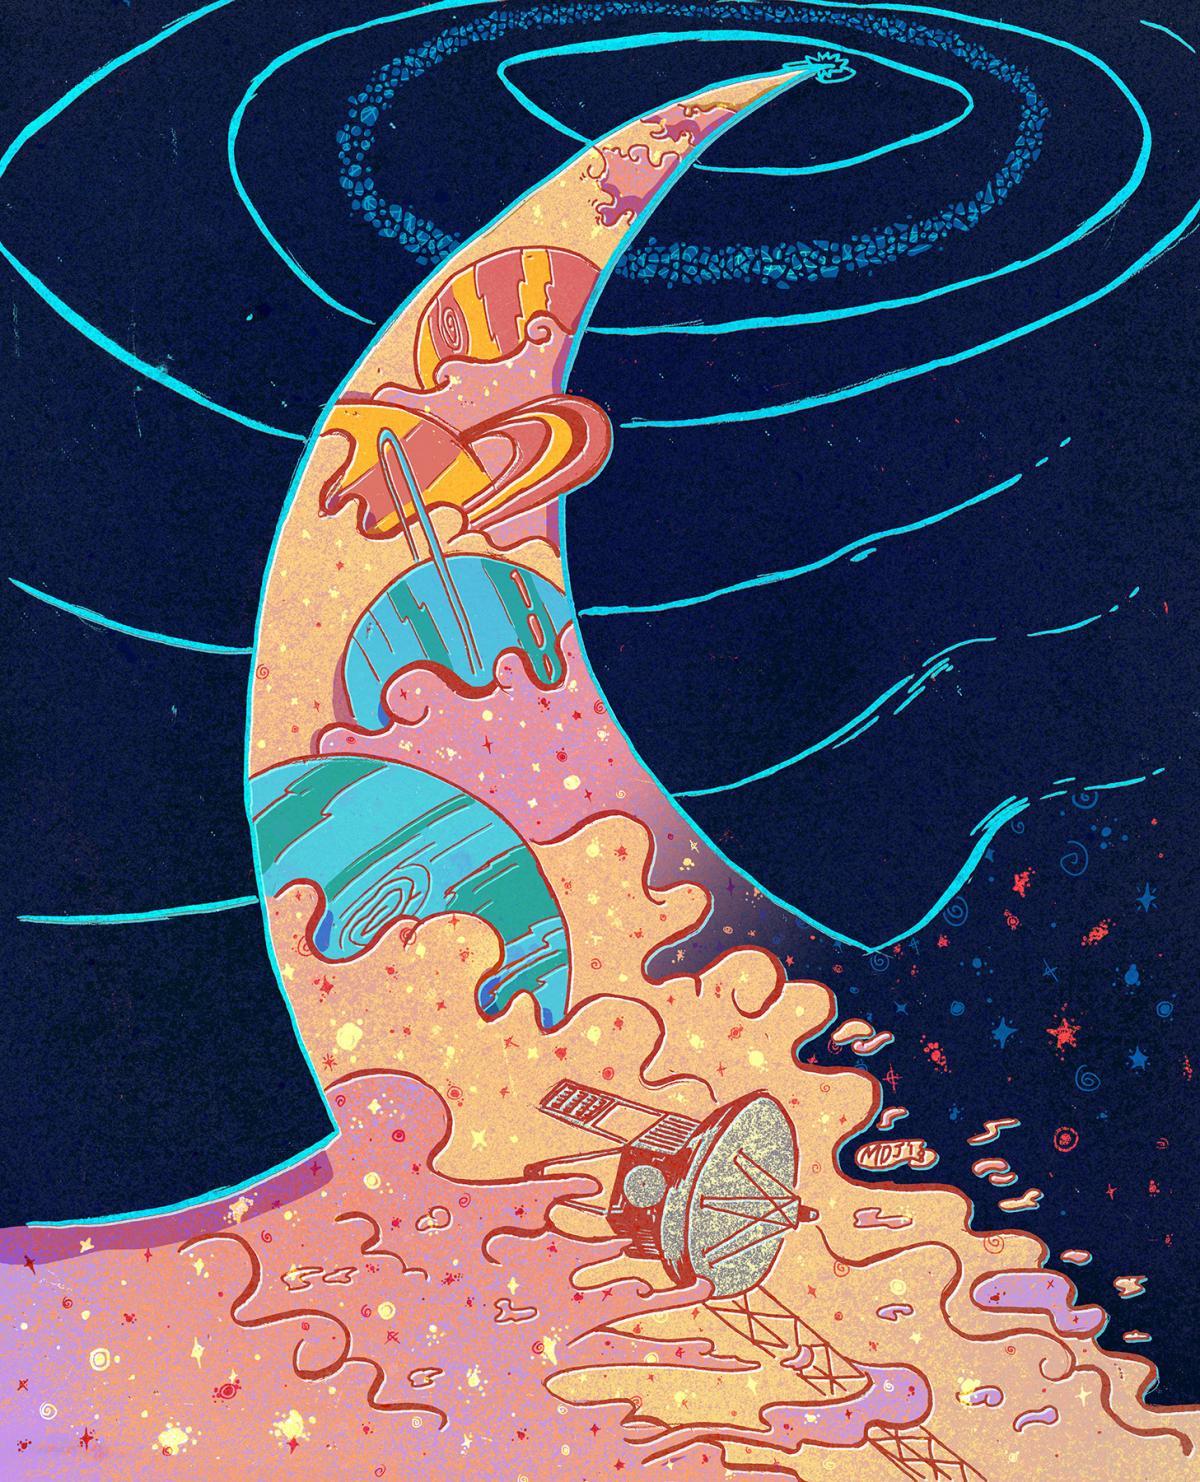 Illustration by Matt Jenkins